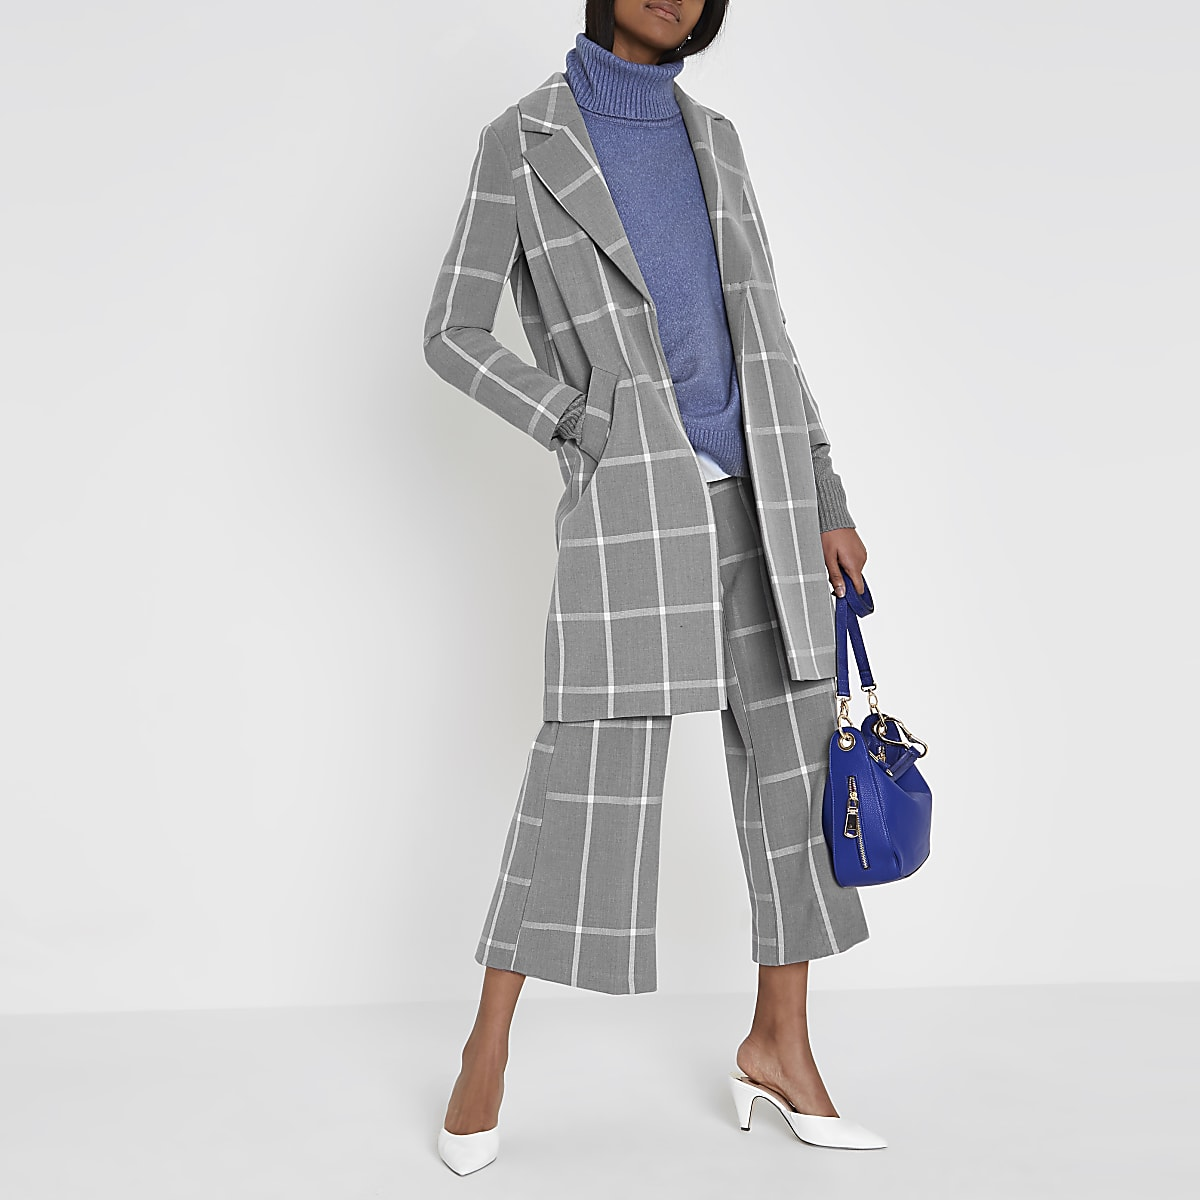 Grey check coat